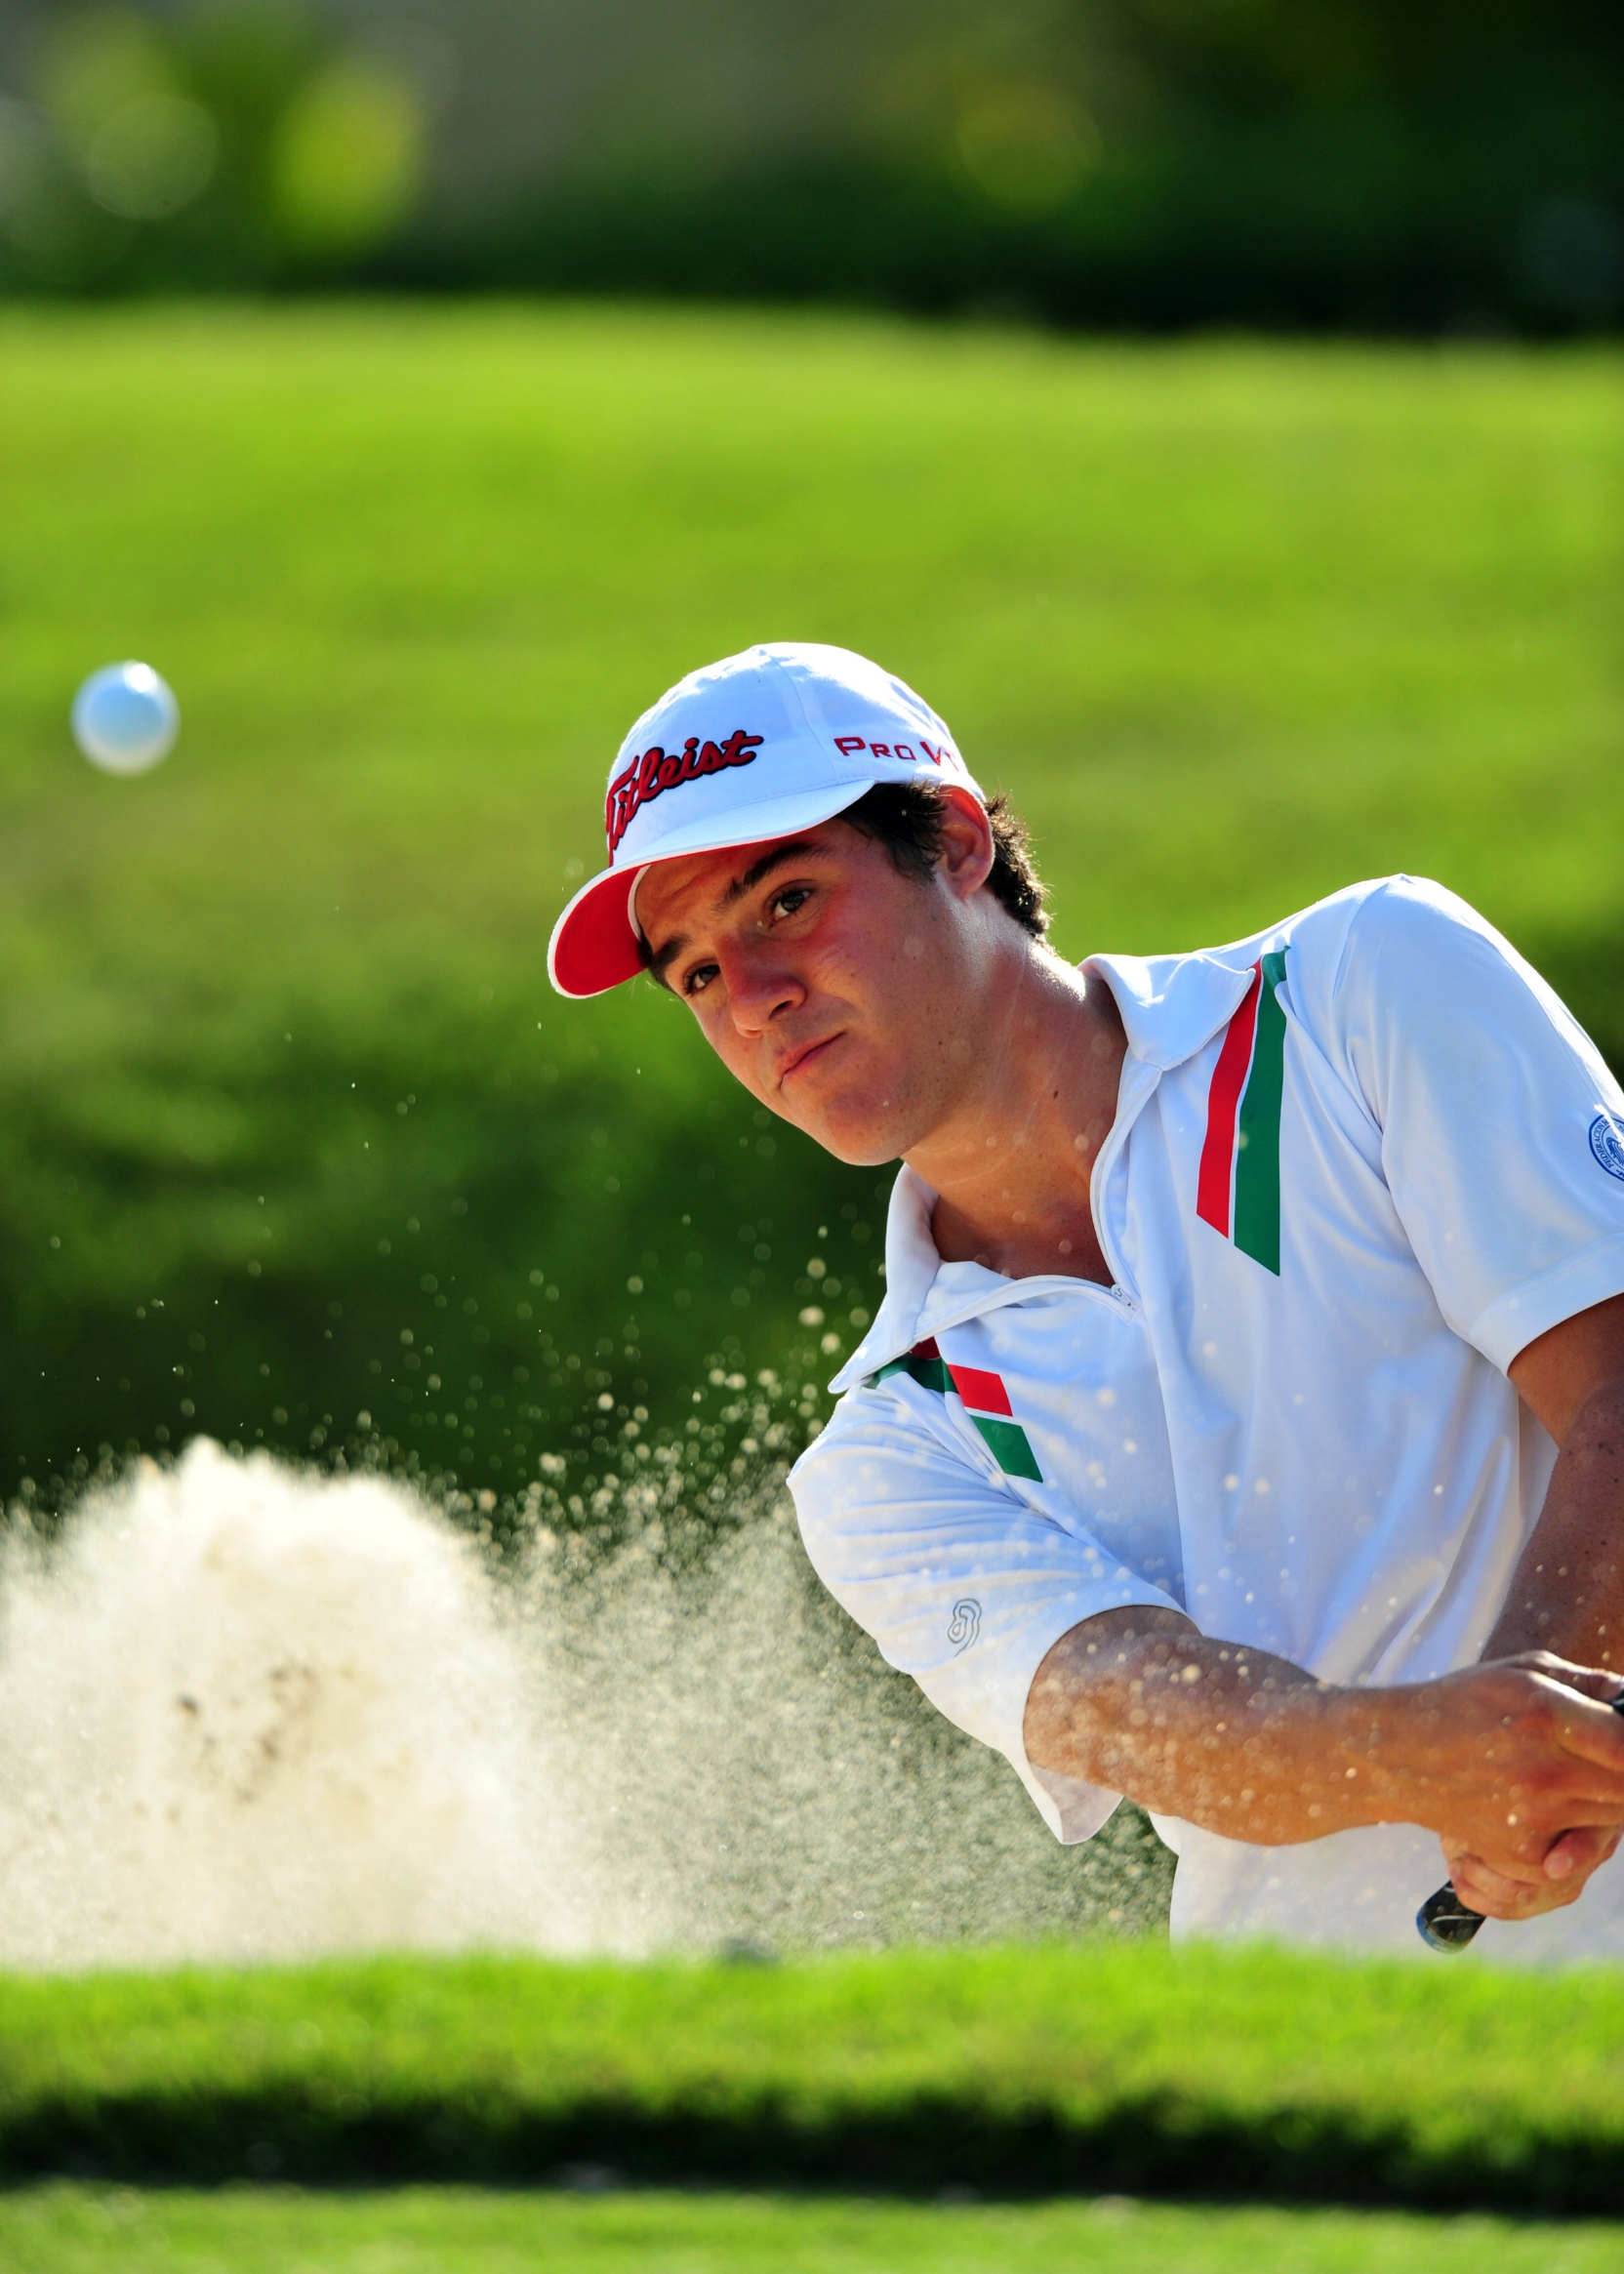 Sebastian Vasquez - Web.com Tour & PGA Tour Latinamerica